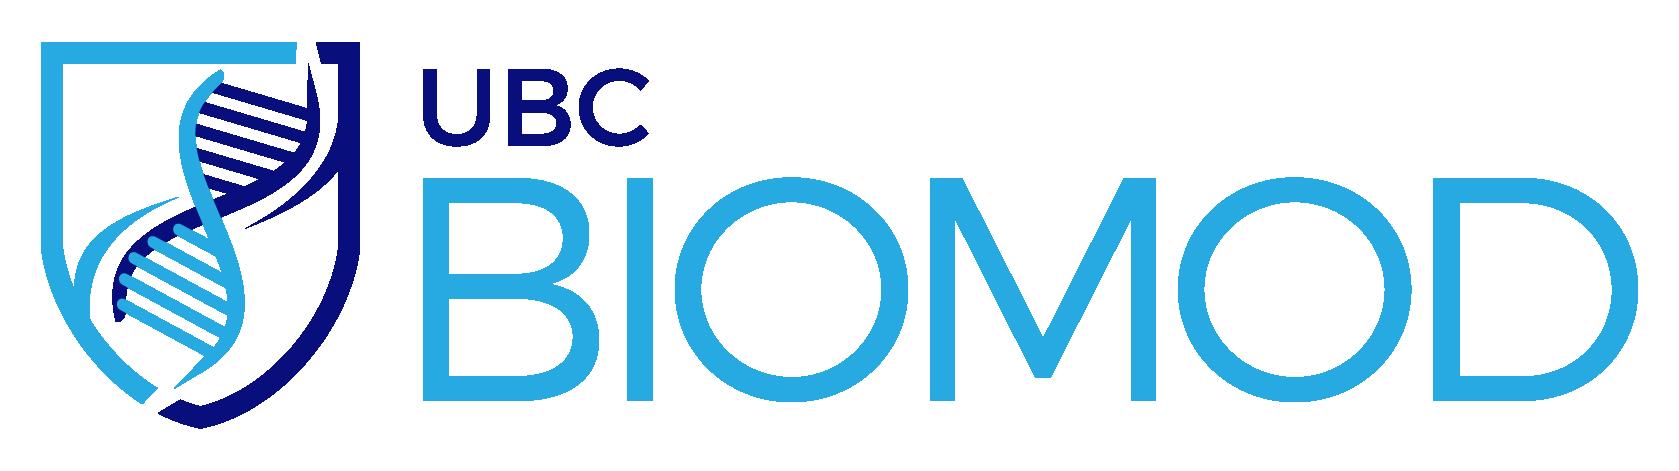 UBC BIOMOD 2018